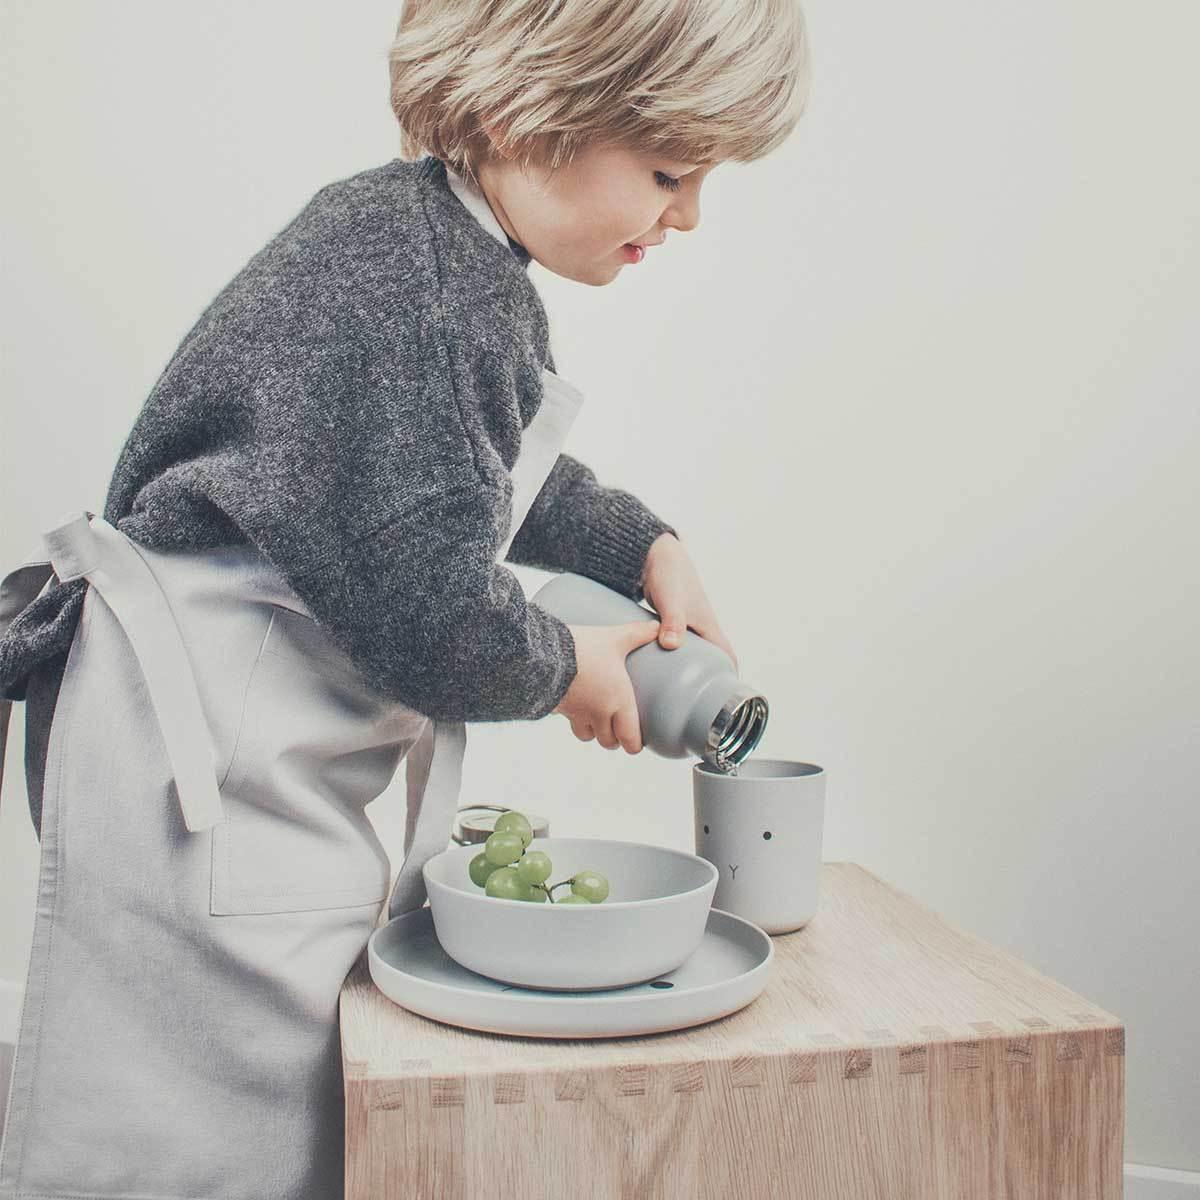 LIEWOOD デンマークから Bente / Bamboo cup / 2pack - Rabbit dumbo grey ラビットコップ2点セット